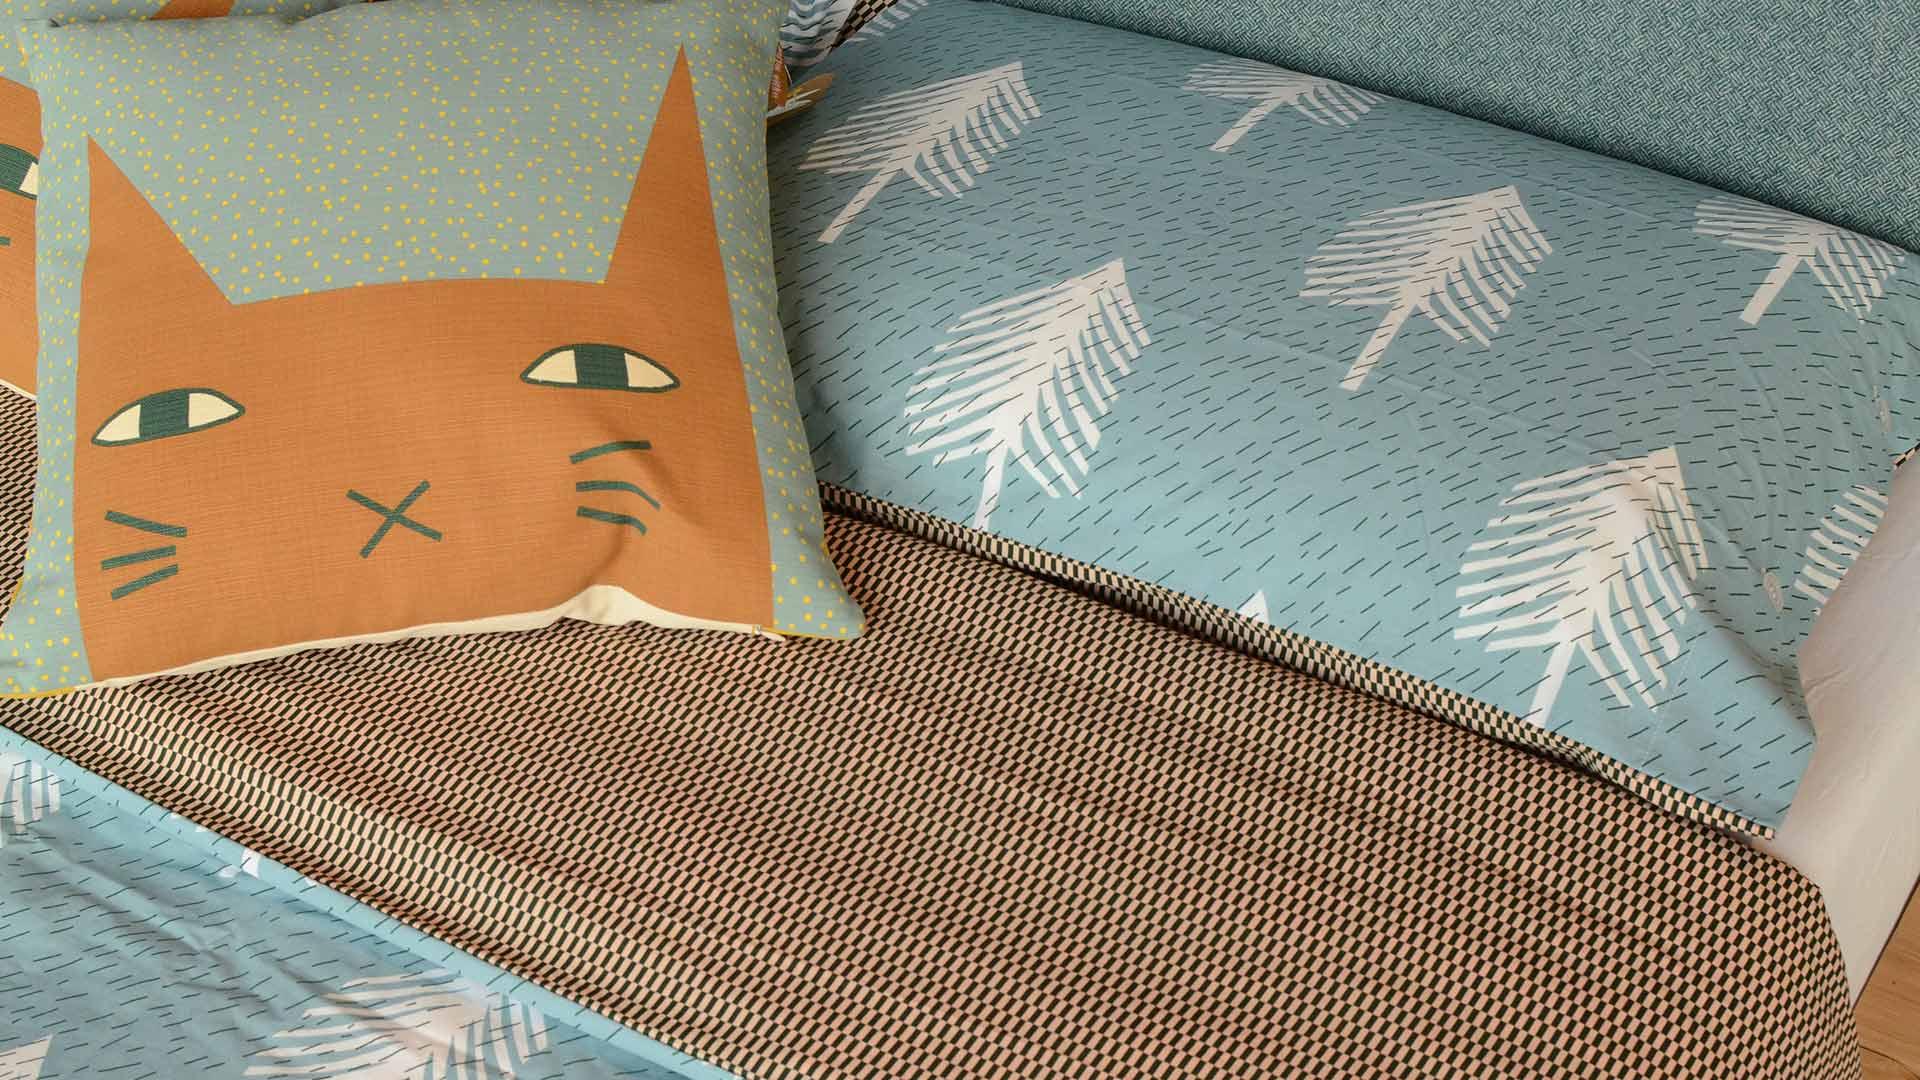 donna-wilson-single-tree-bedding-&-cat ears cushion